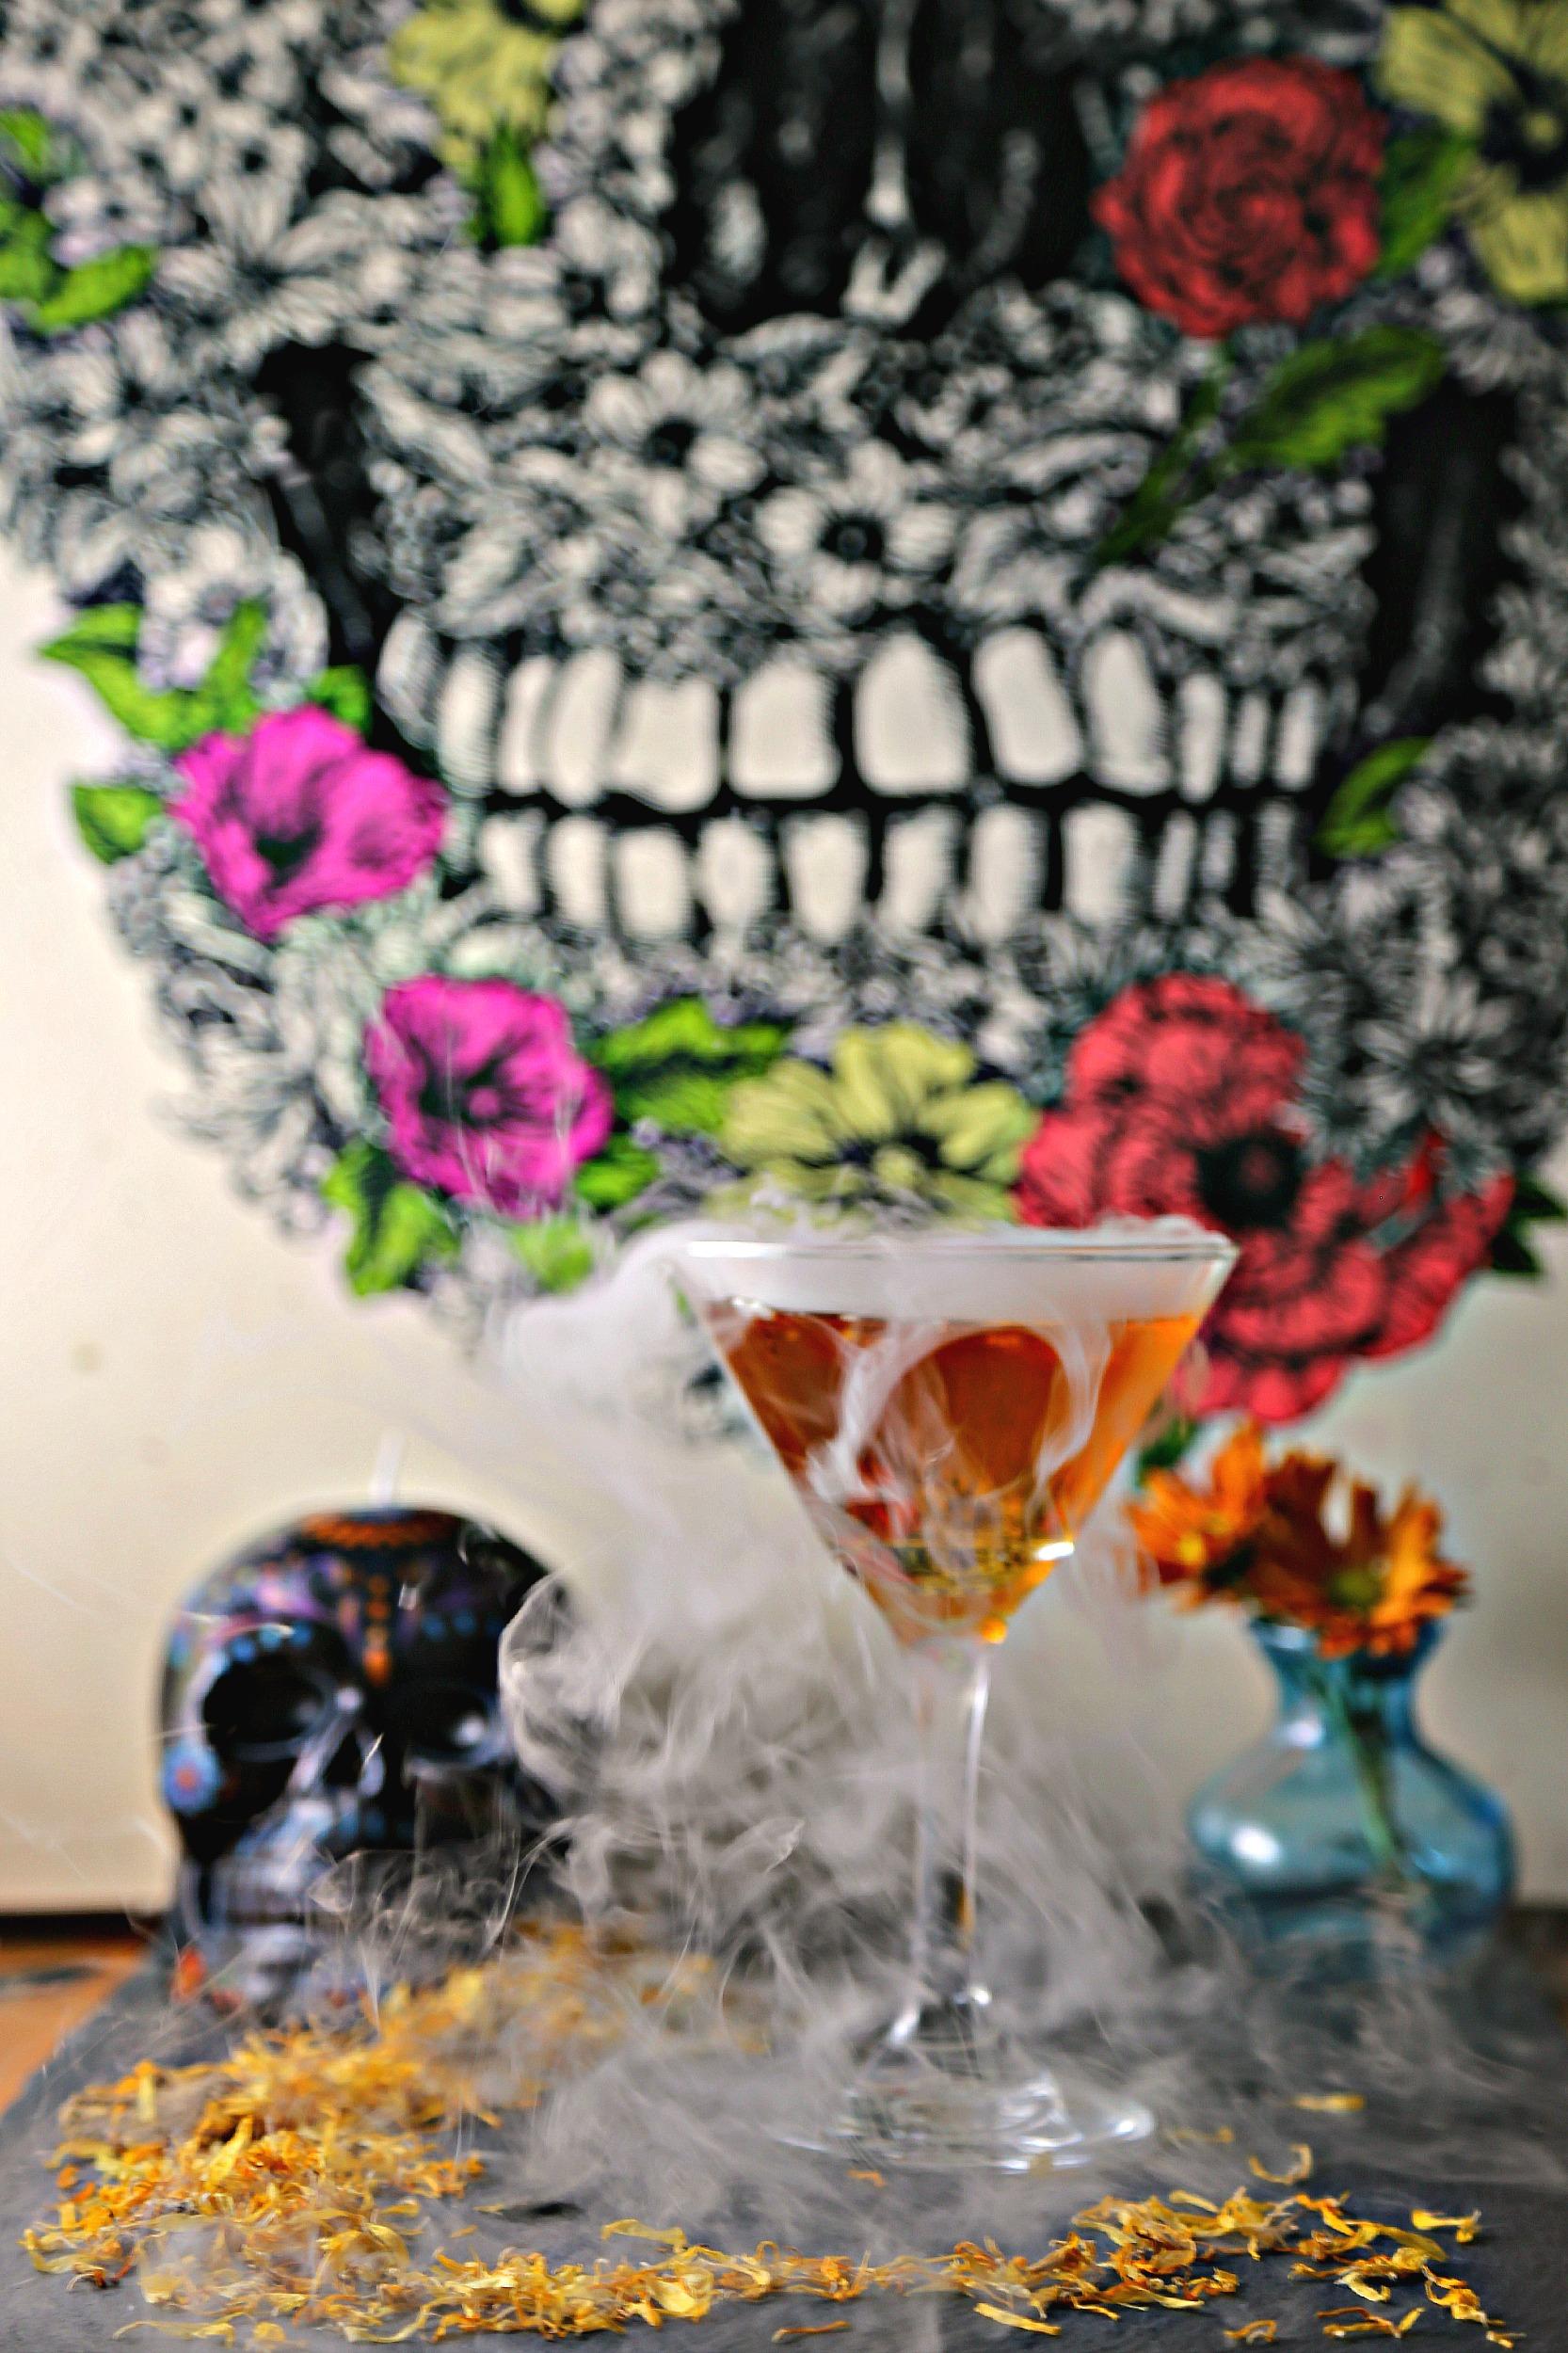 dia-de-los-muertos-martini-marigold-martini-dayofthedead-cocktail-vianneyrodriguez-sweetlifebake